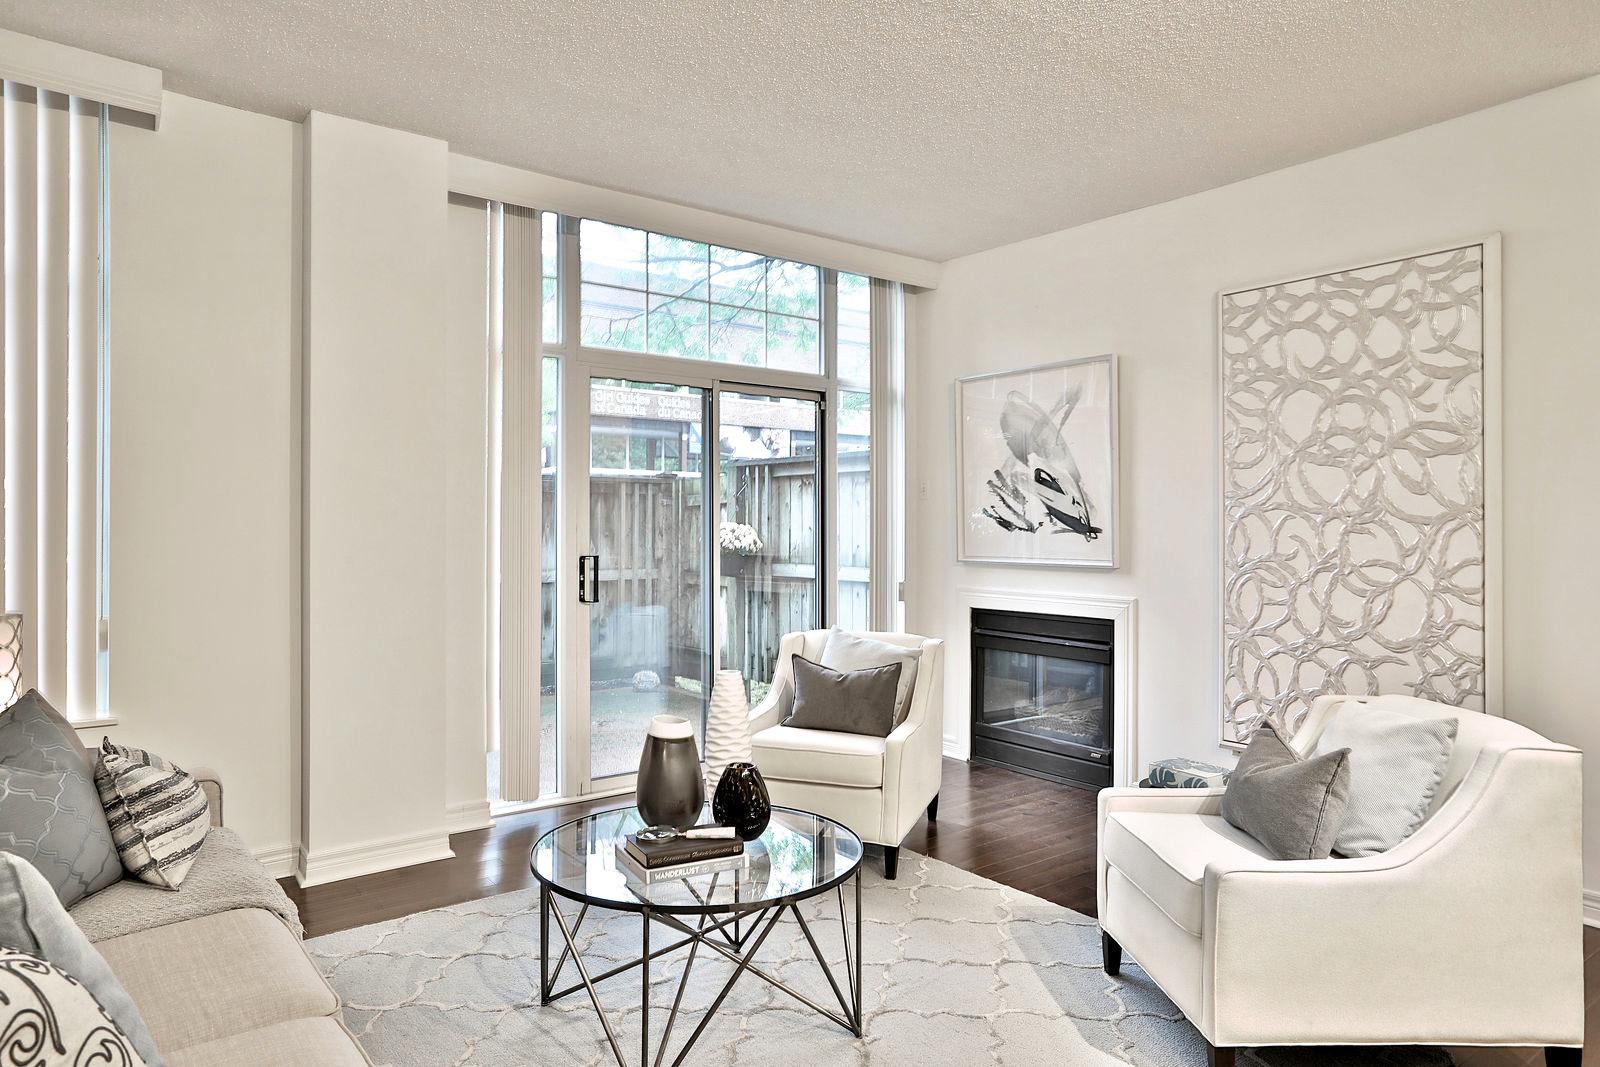 35 Merton Living Room Chairs.jpg